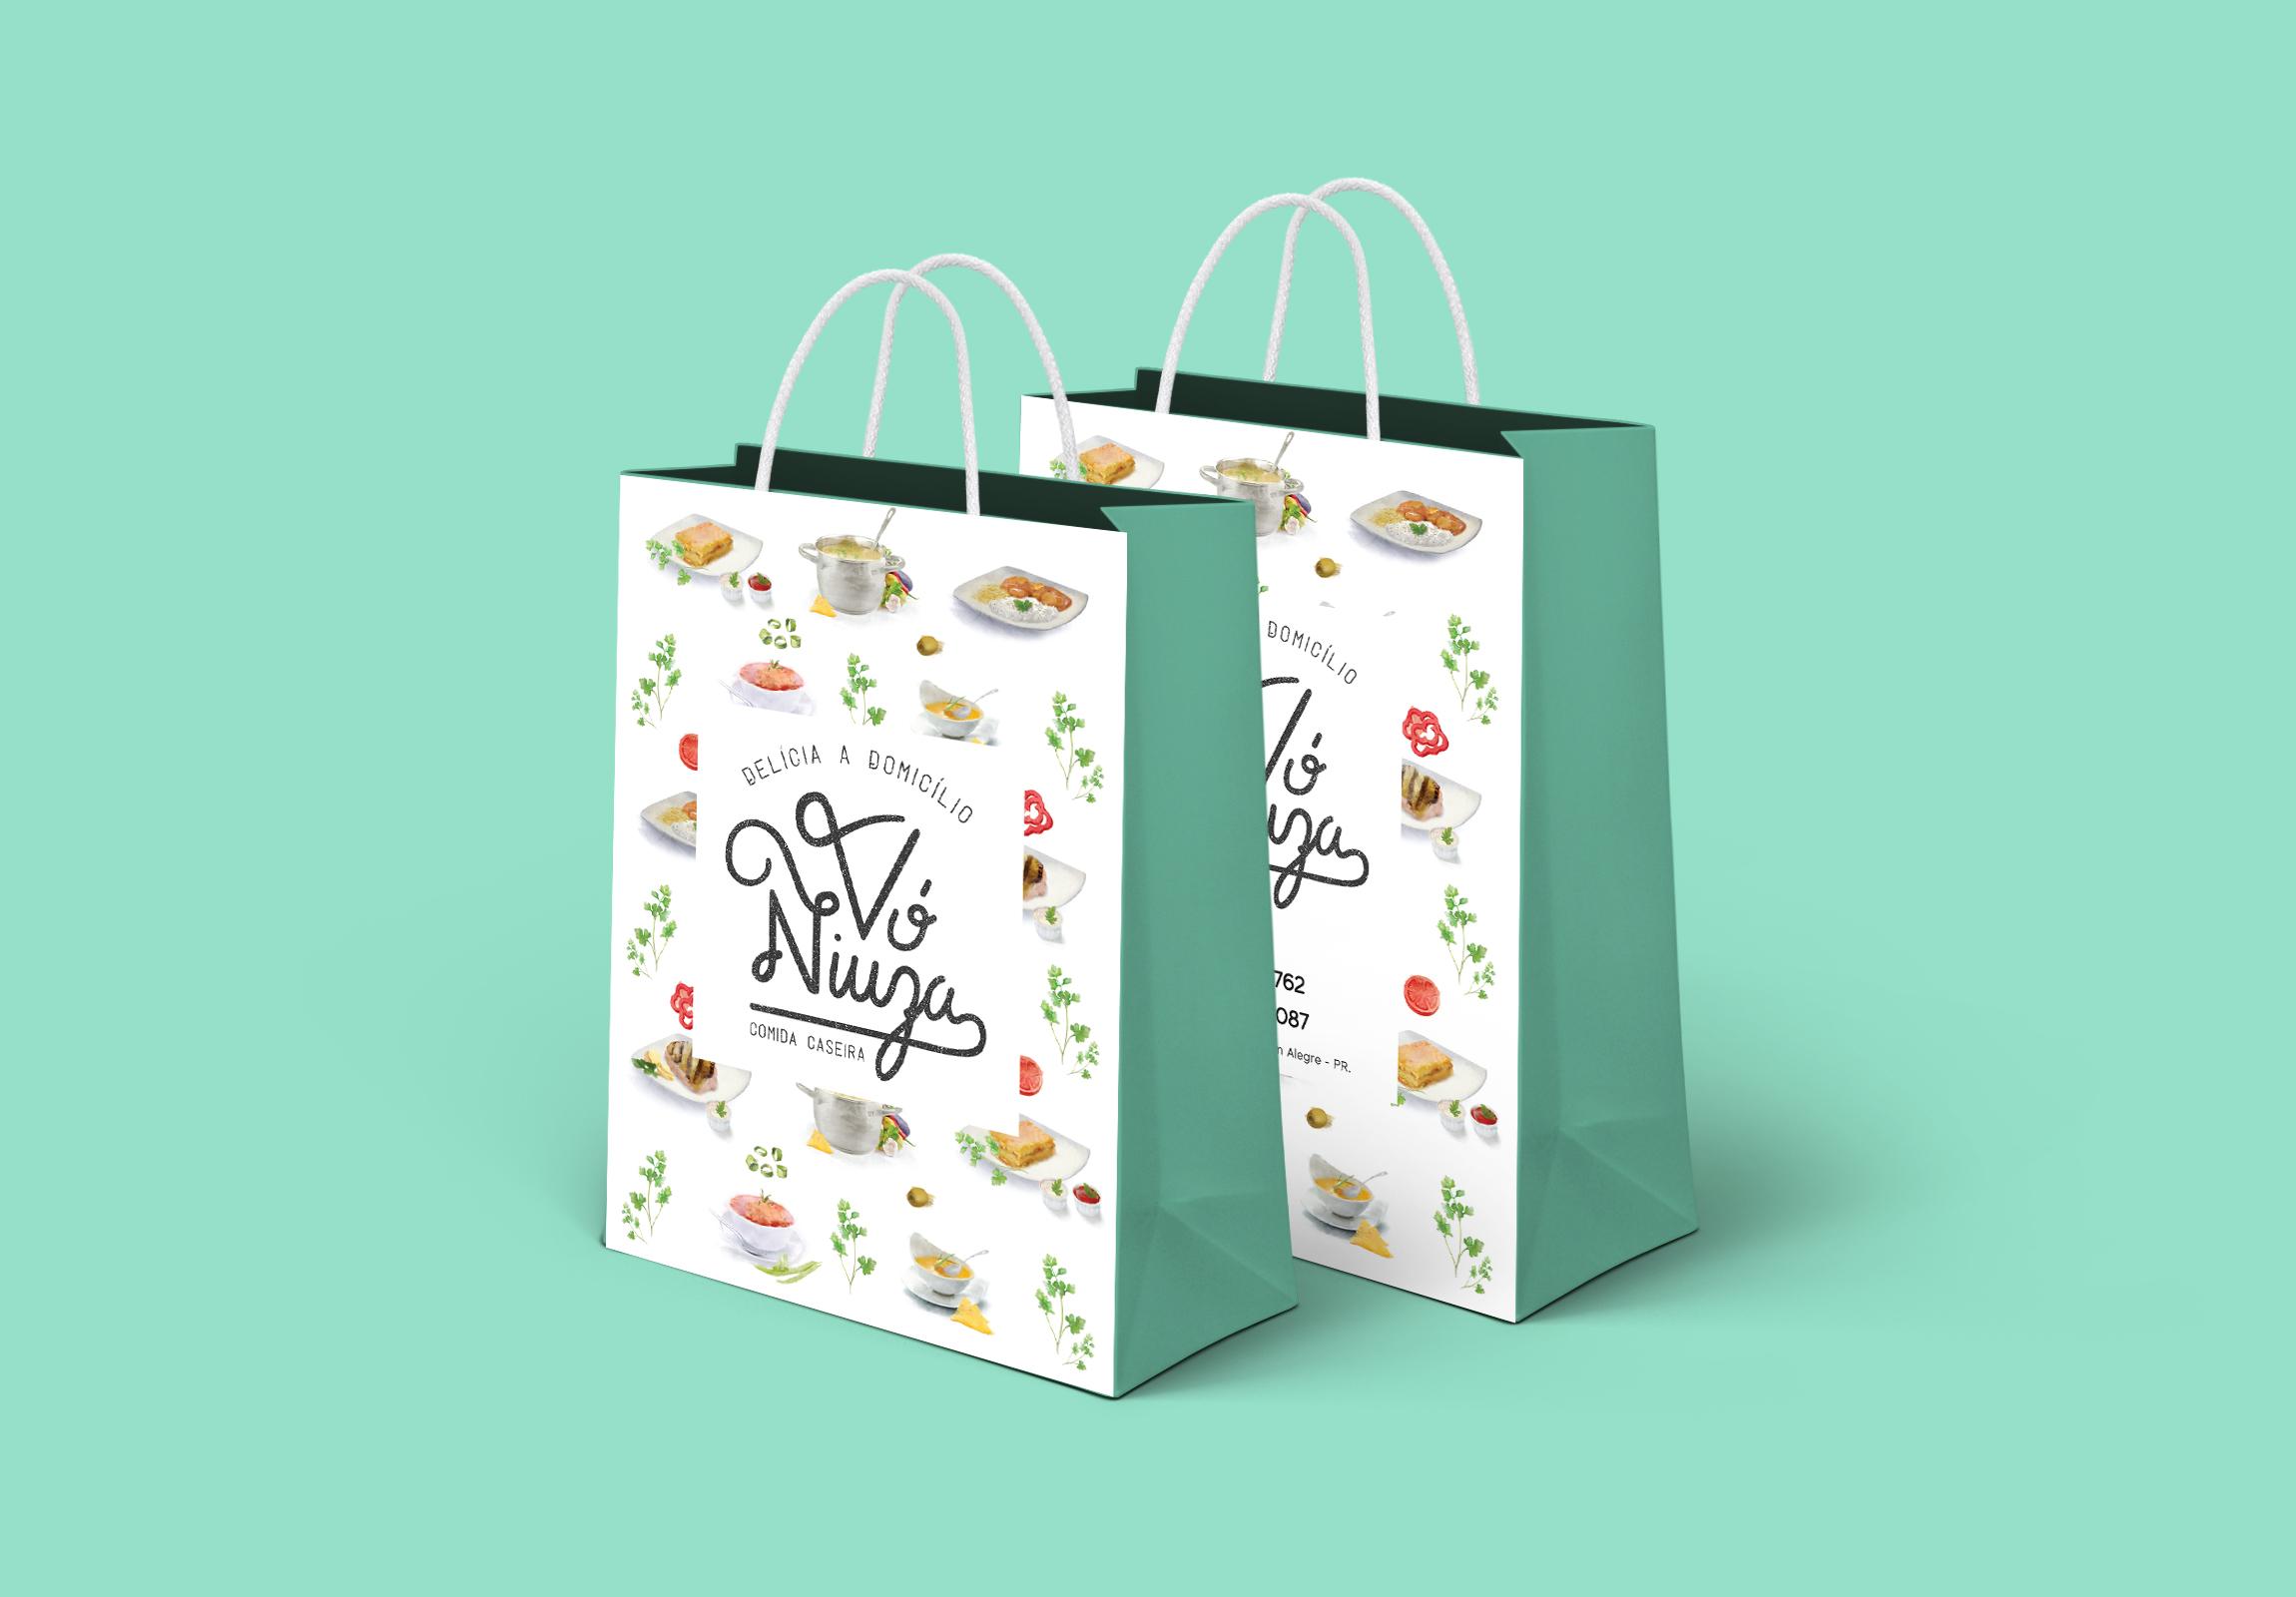 Inteligencia Marketing - VÓ NIUZA – NOVA IDENTIDADE - Shopping Bag PSD MockUp